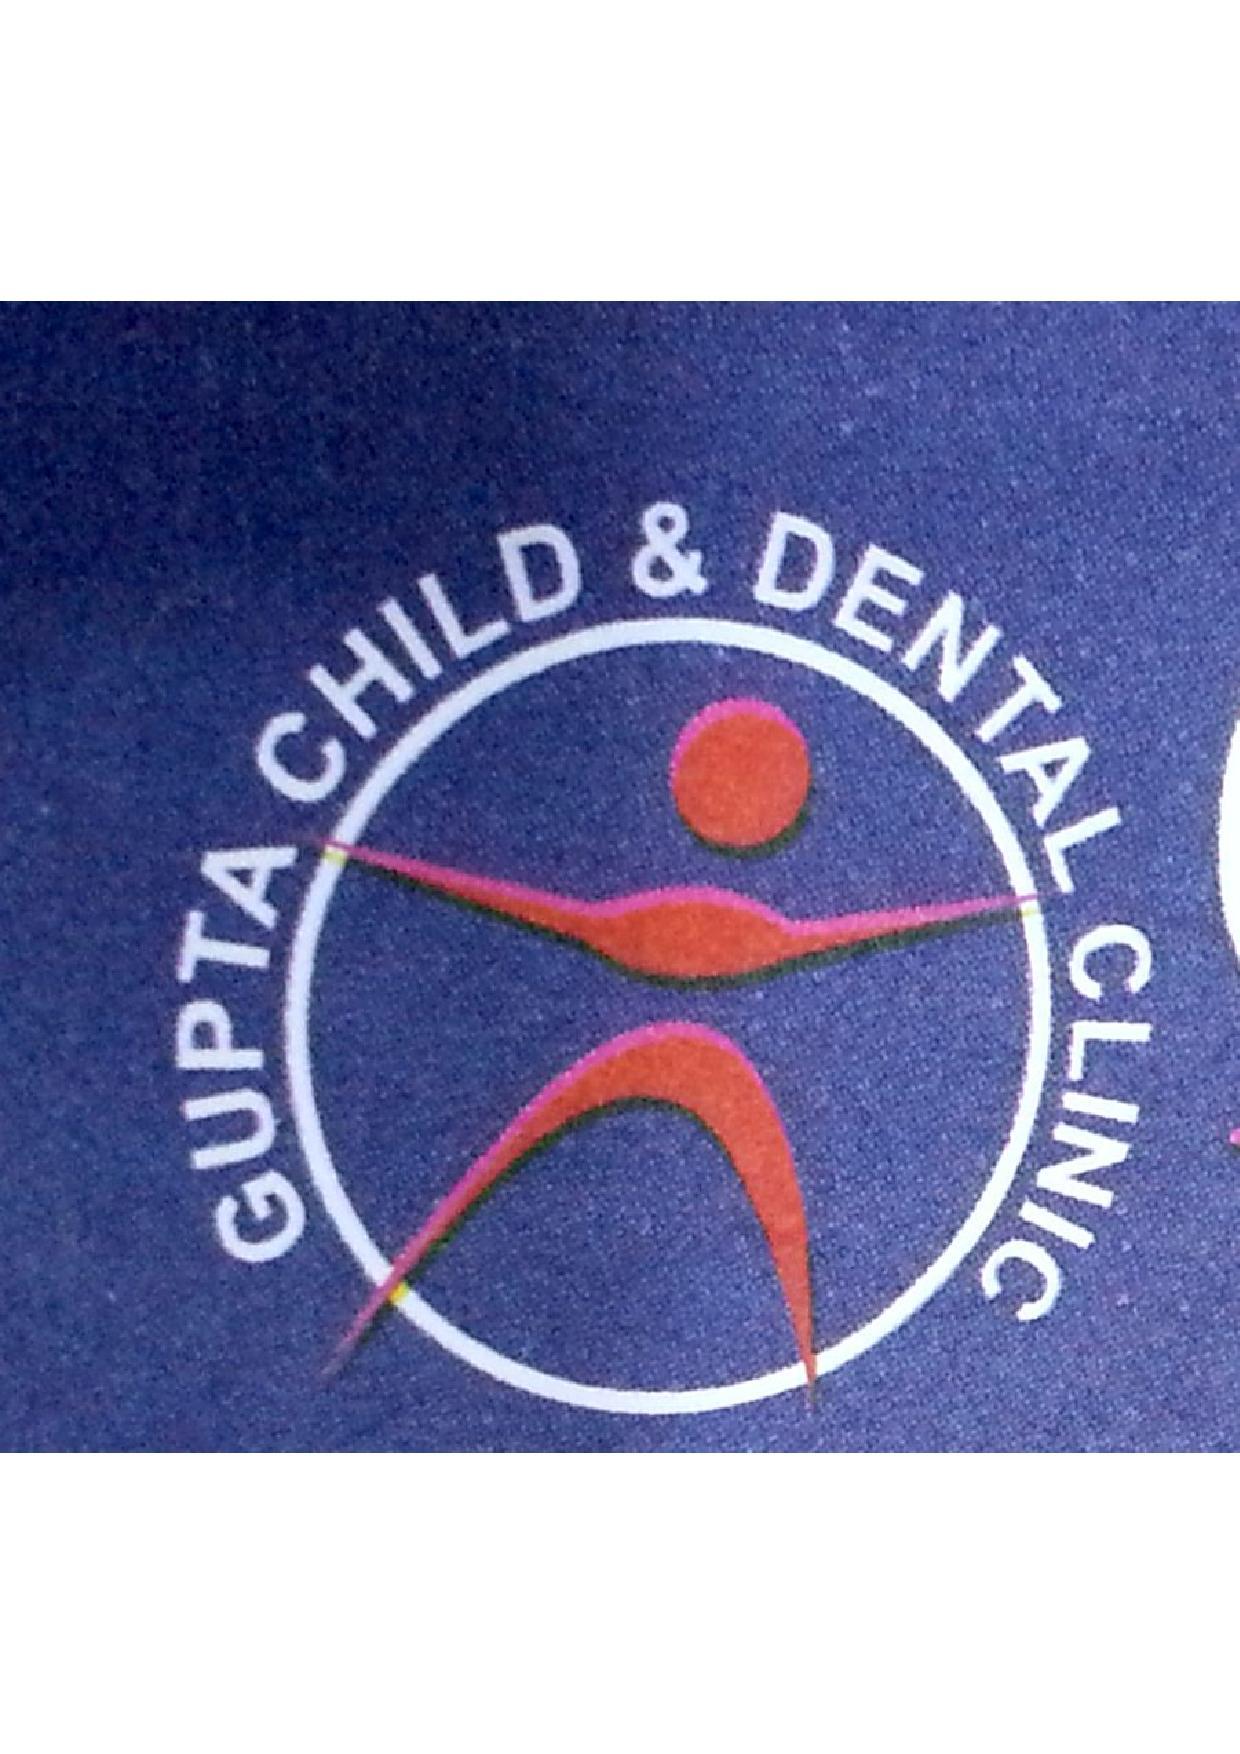 Gupta Child and Dental clinic